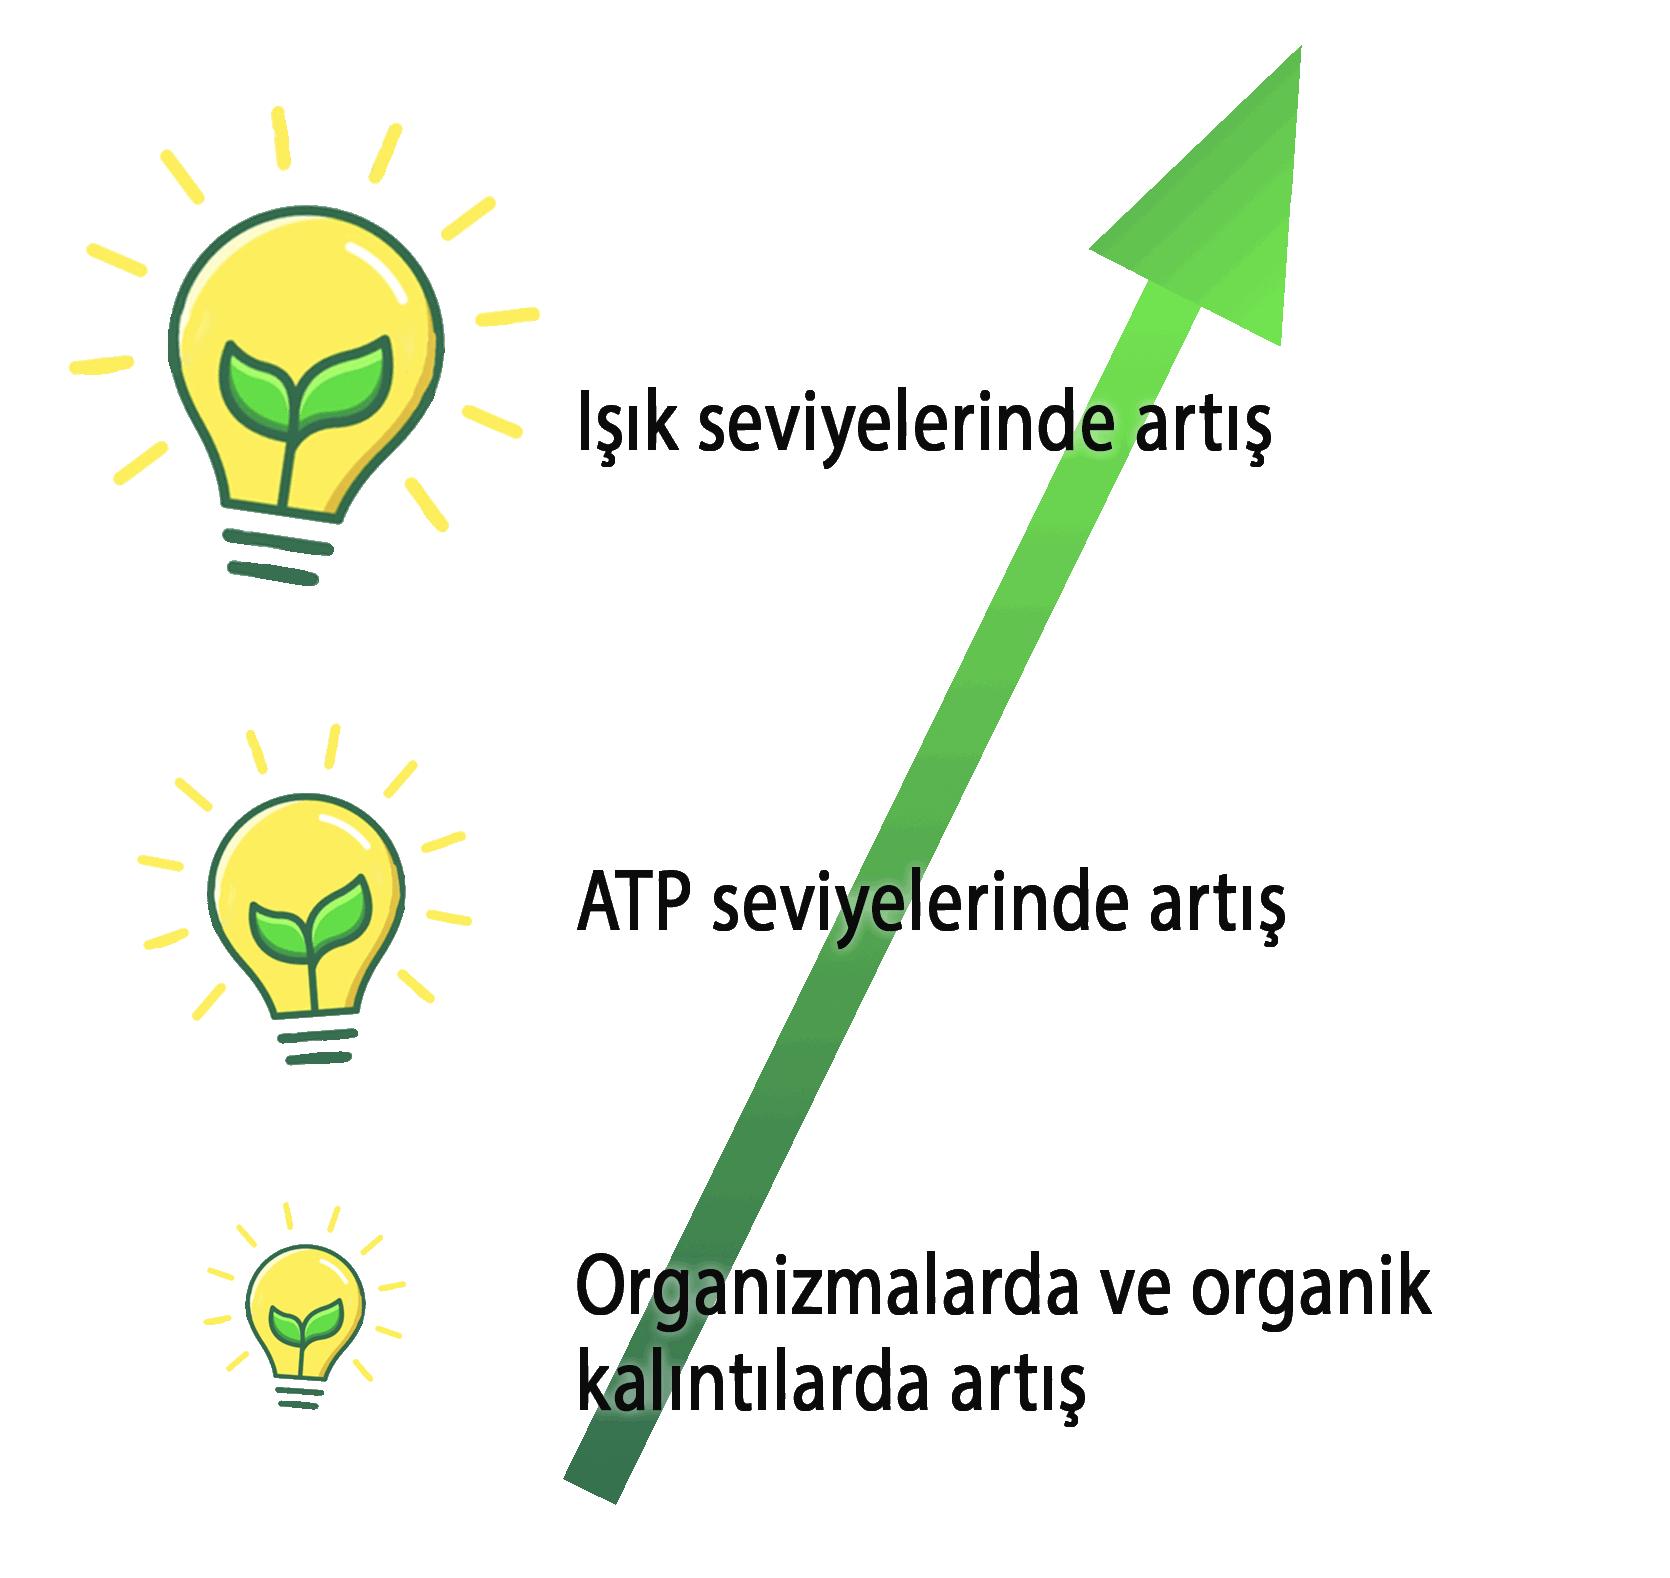 light in atp